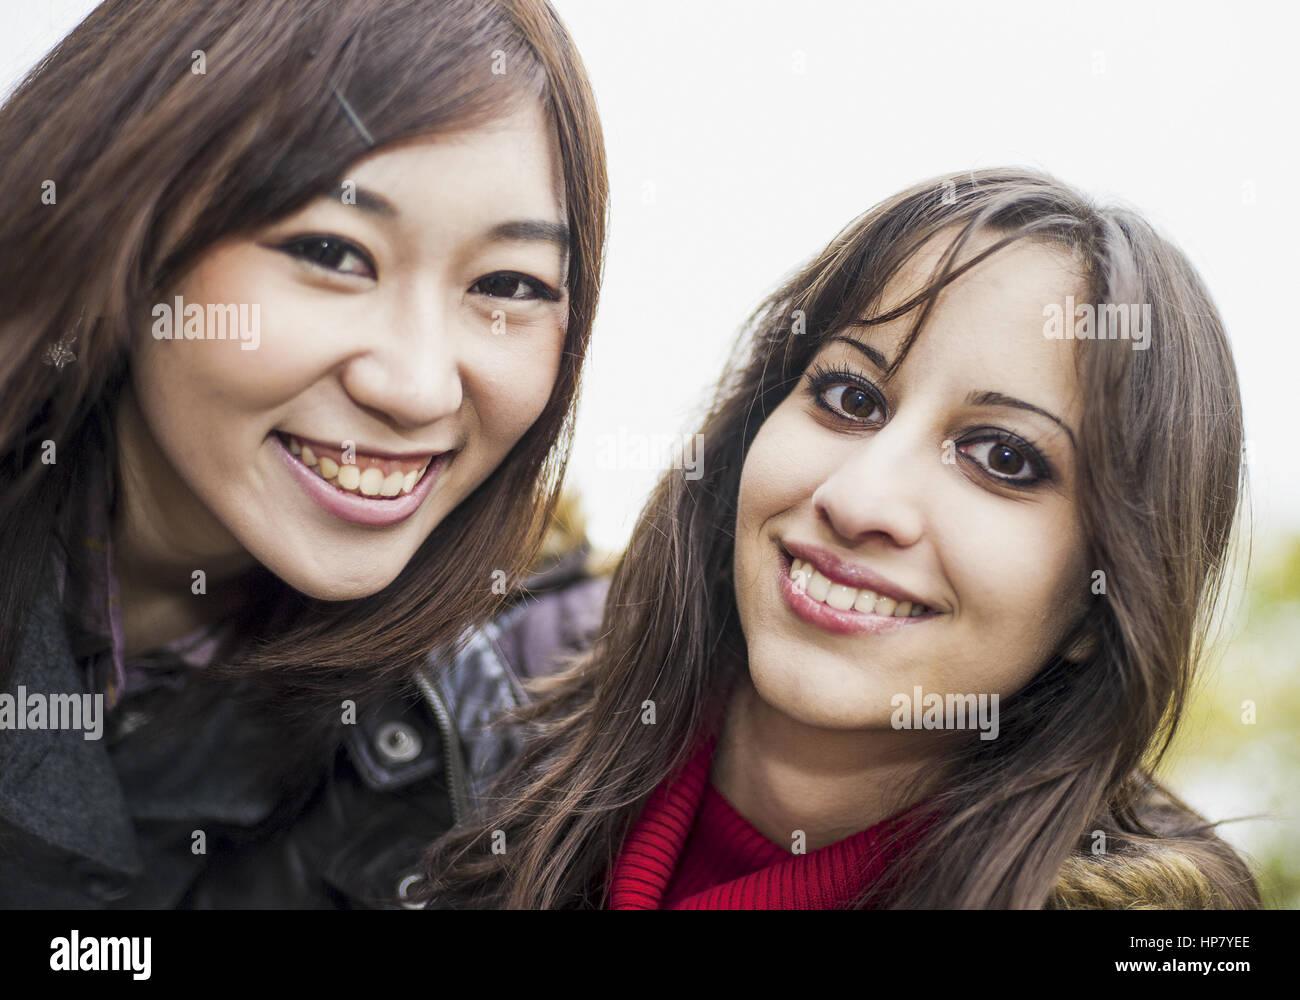 Orientalische und asiatische Frau, Portraet (model-released) - Stock Image